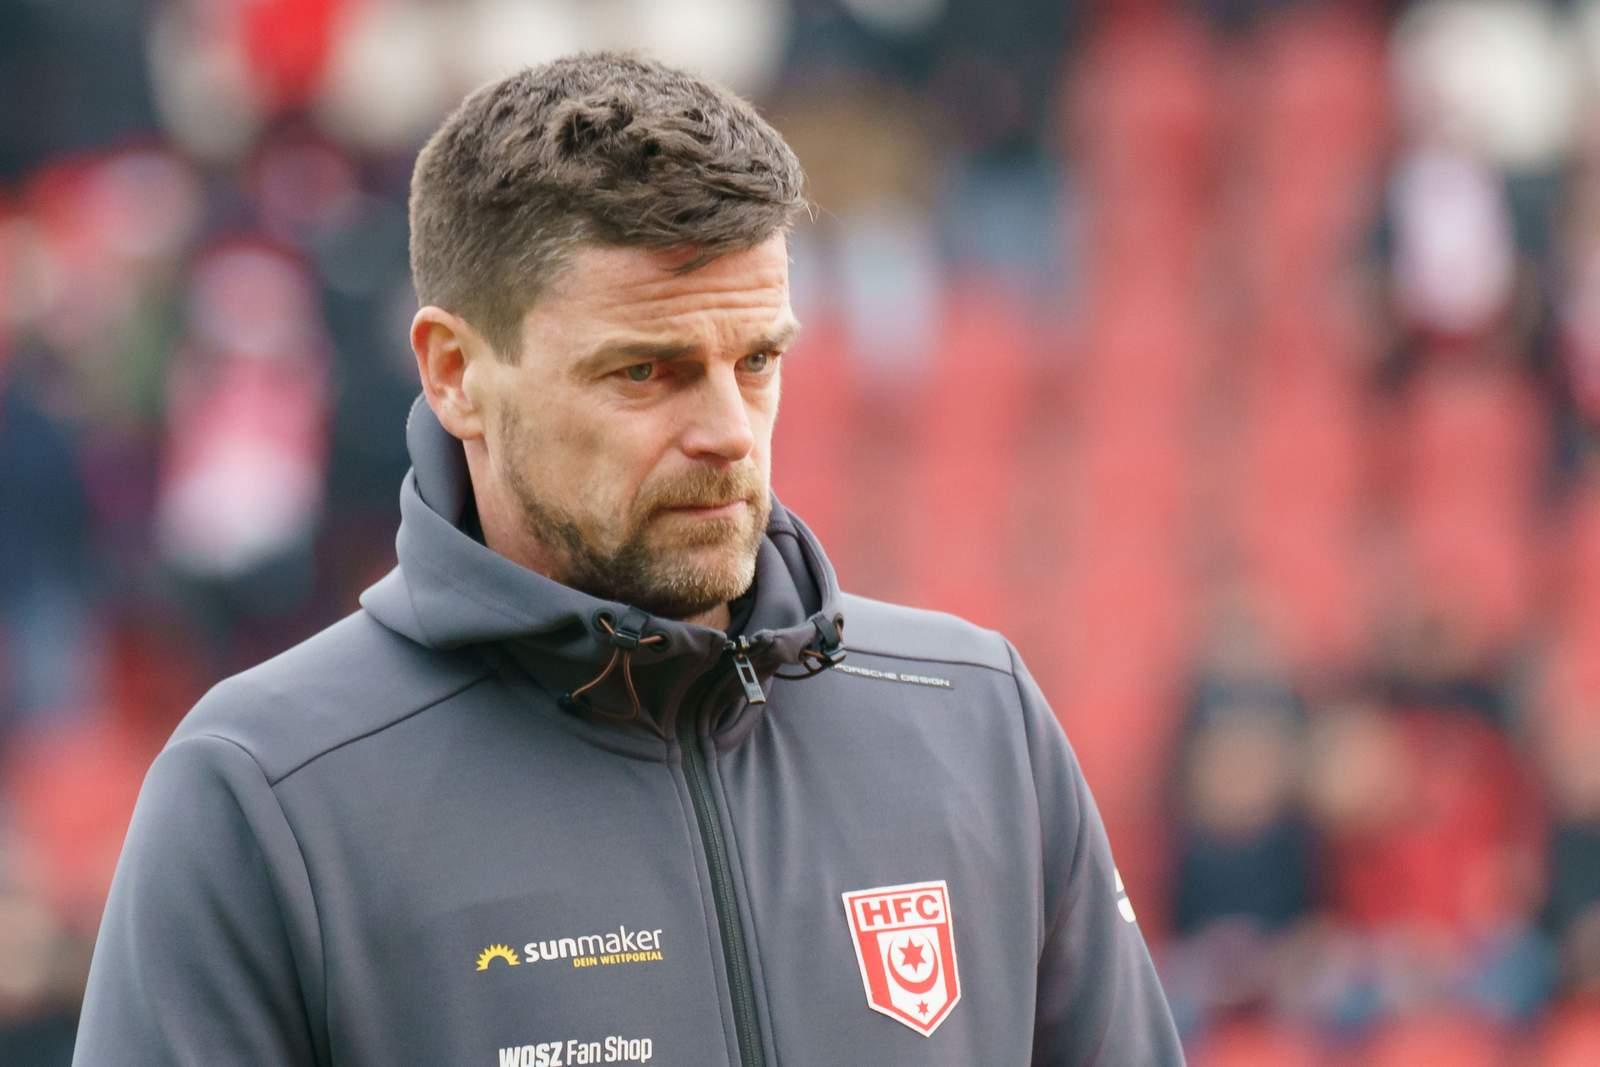 Torsten Zieger als Trainer des HFC